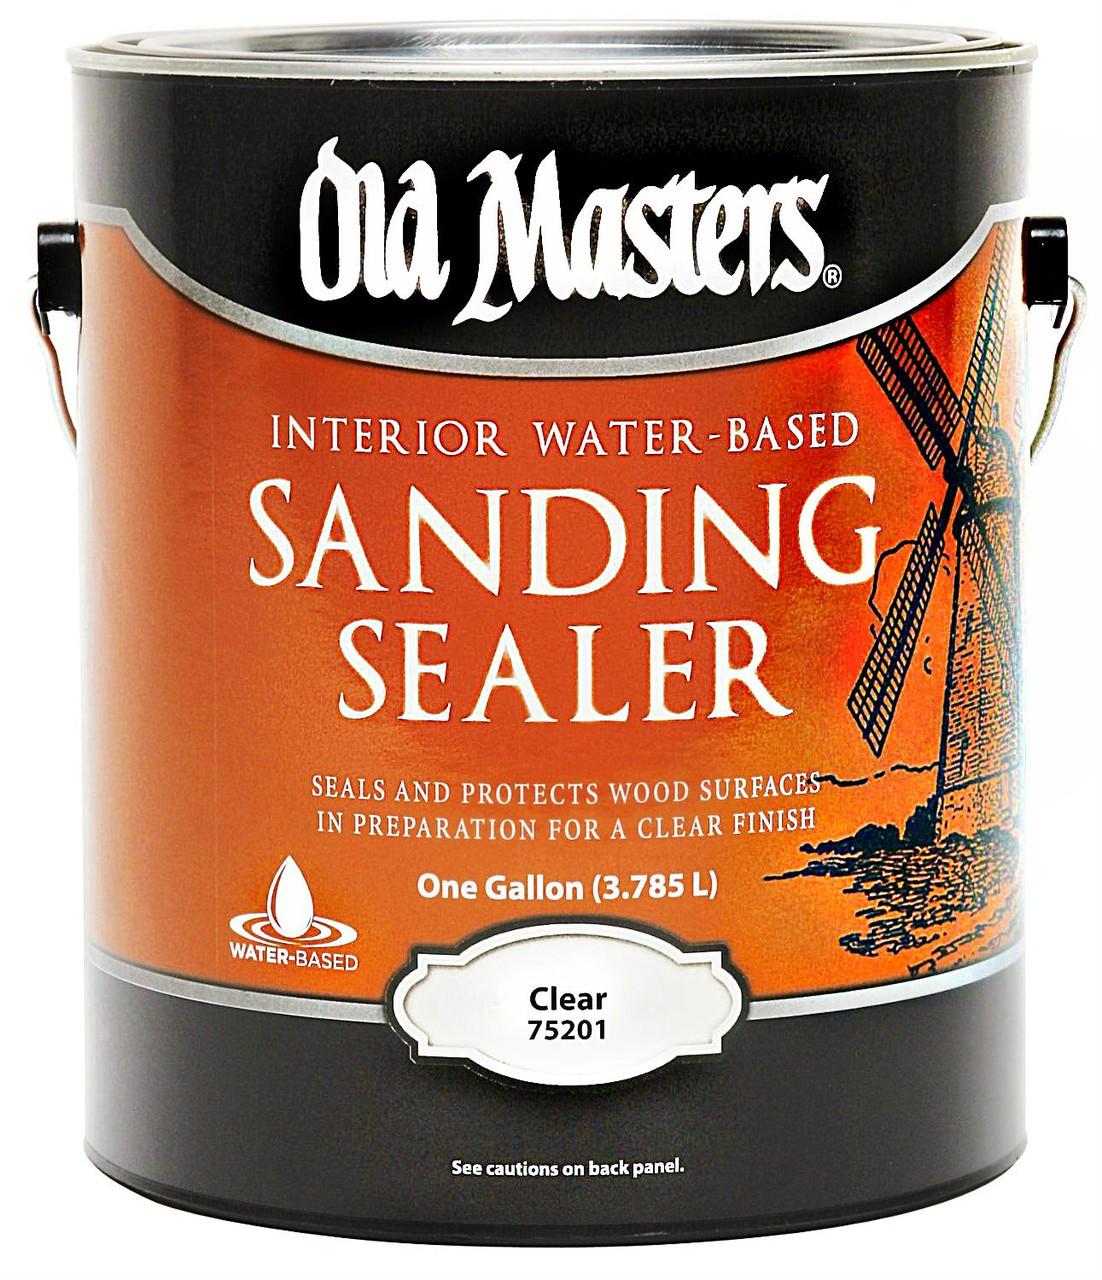 Old Masters Interior Oil Based Sanding Sealer Gallon   Premier Paint U0026  Wallpaper